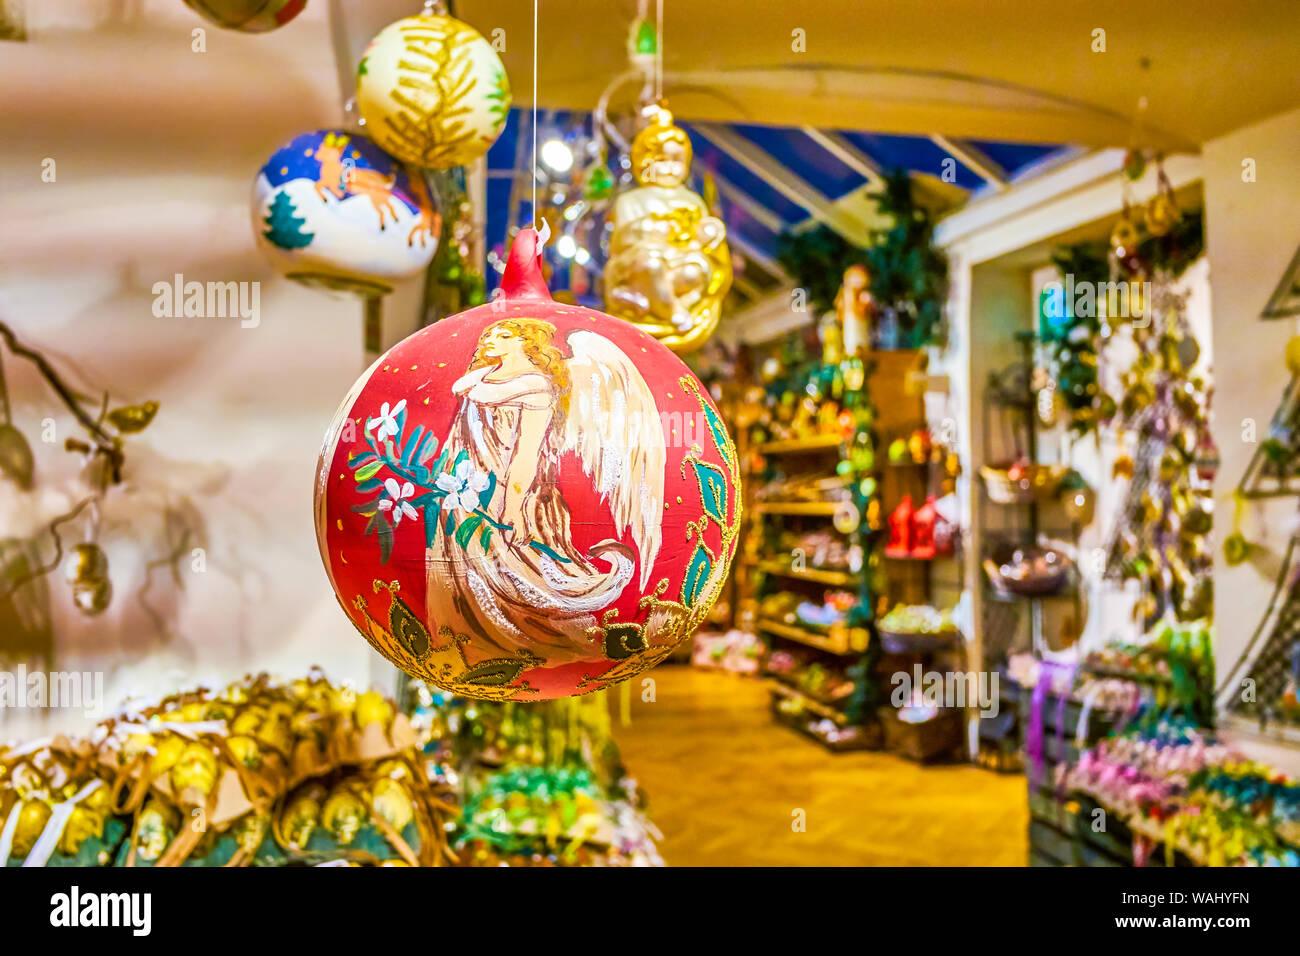 Christmas In Austria 2019.Salzburg Austria February 27 2019 The Beautiful